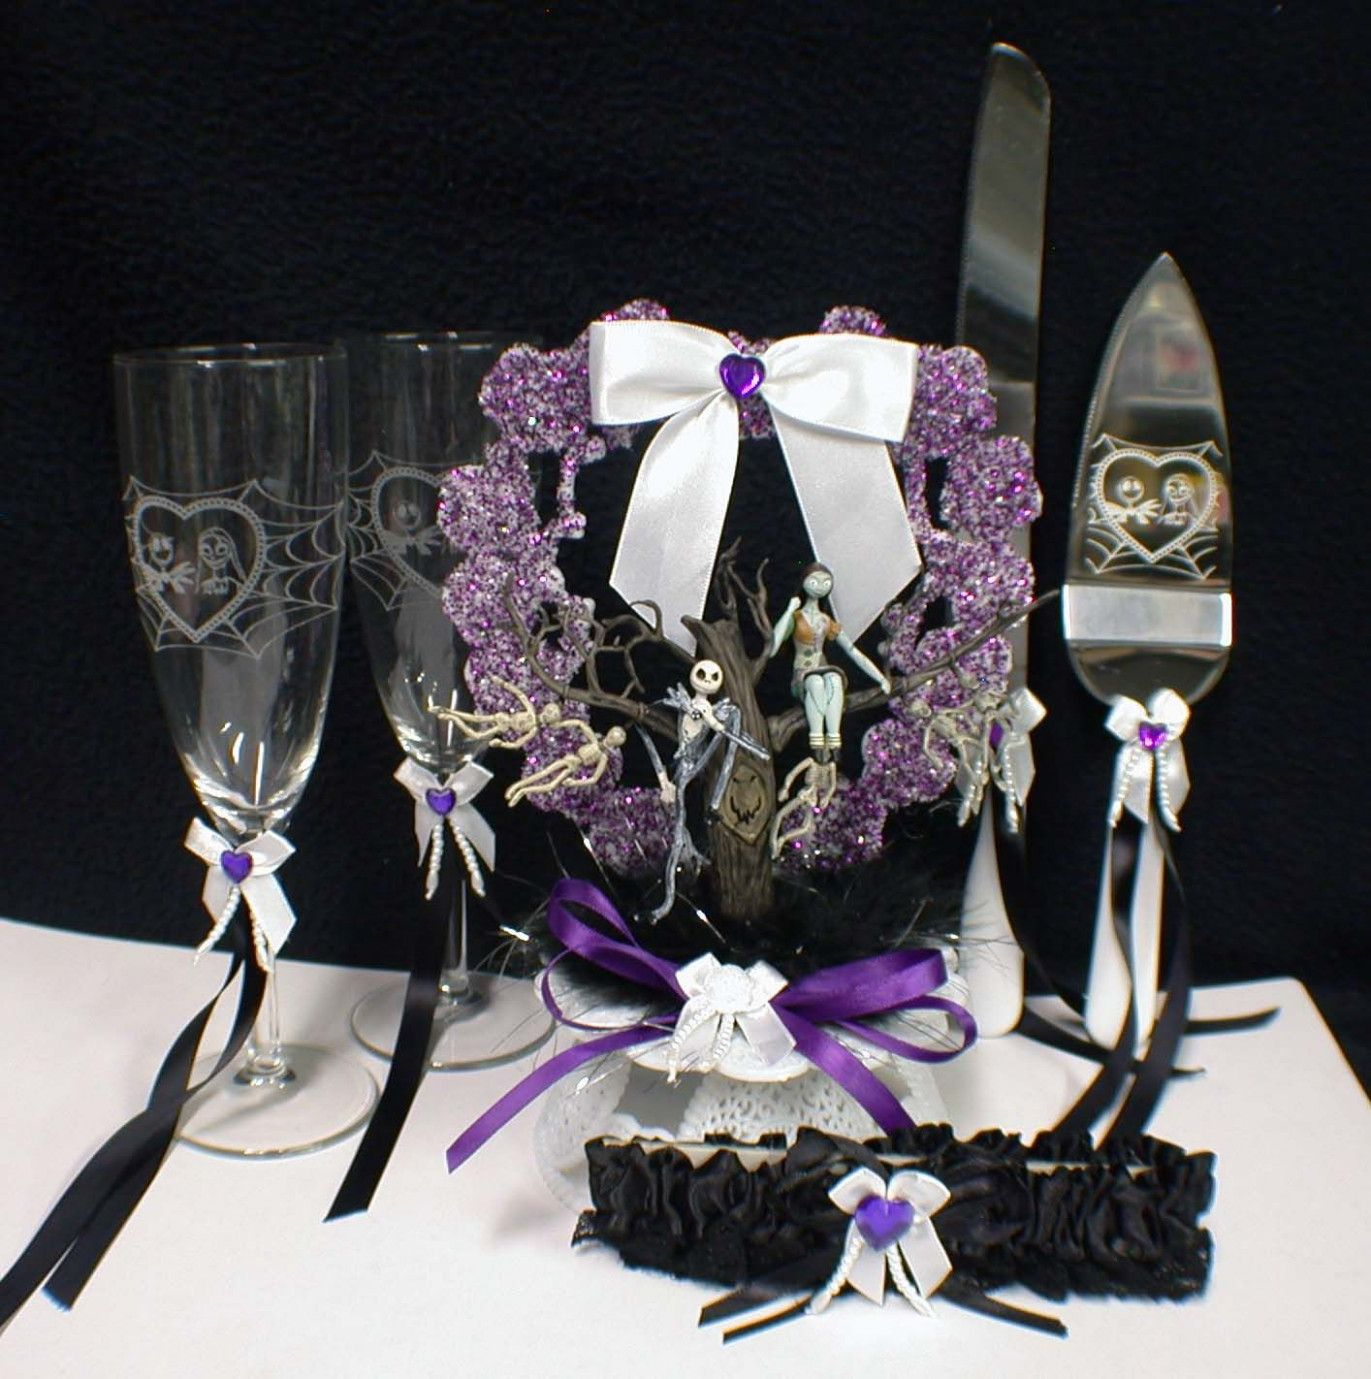 Nightmare Before Christmas Wedding Ideas   wedding photo   Pinterest ...